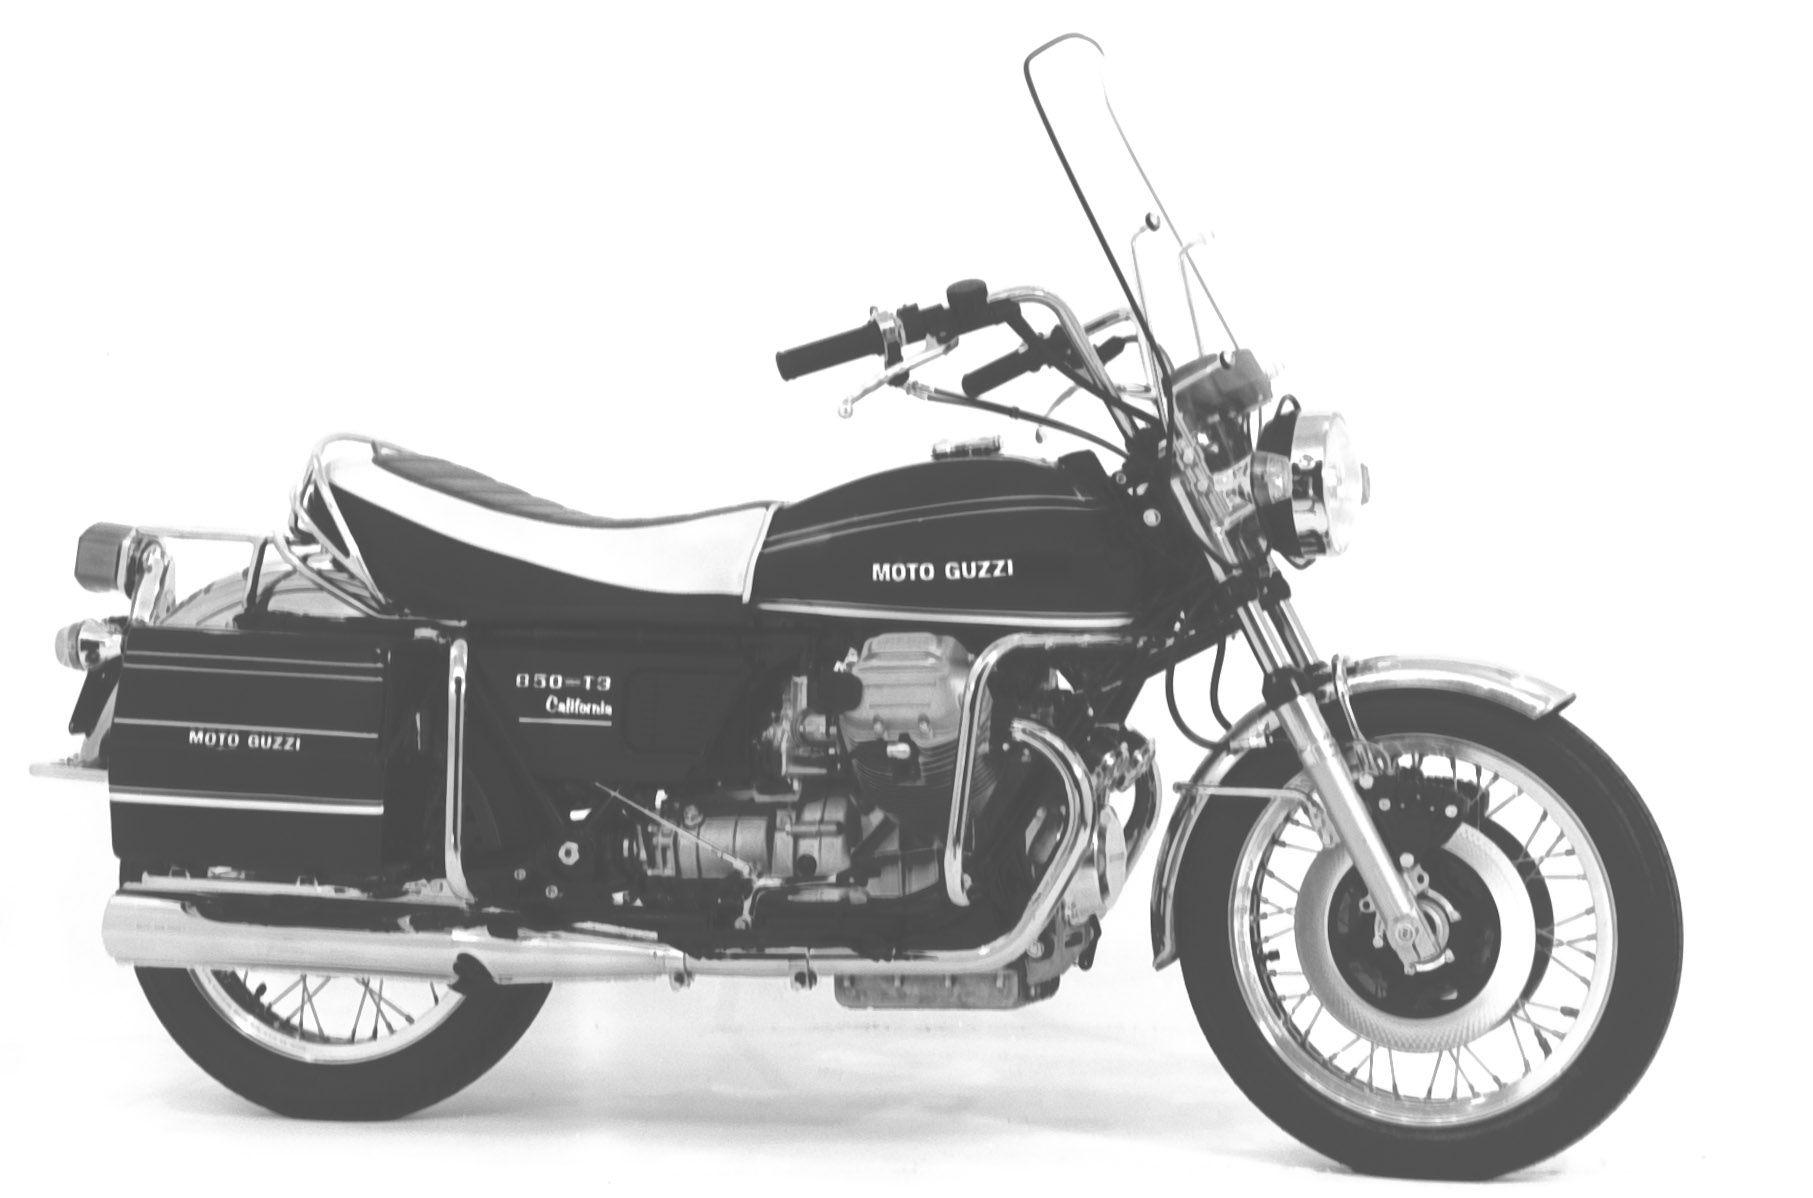 moto guzzi 850 t3 california 1975 1980 moto guzzi. Black Bedroom Furniture Sets. Home Design Ideas